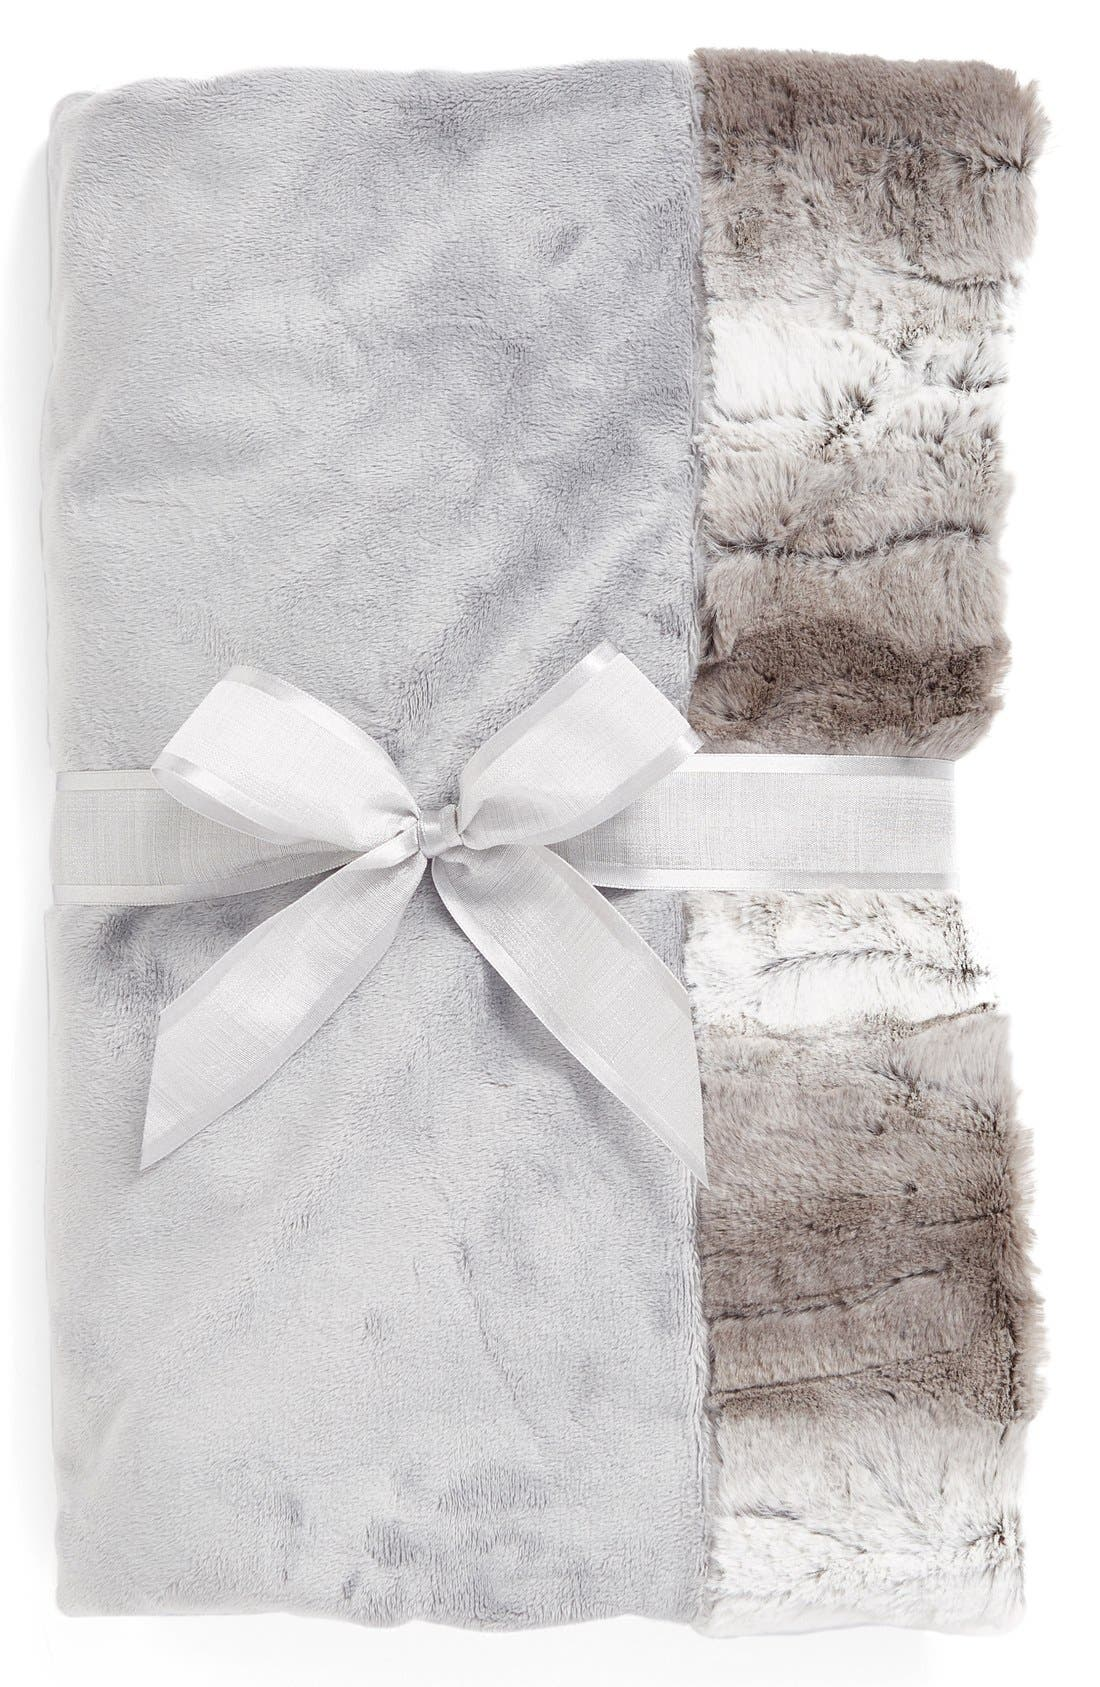 Sonoma Lavender Silver Ombré Blankie (Nordstrom Exclusive) ($70 Value)